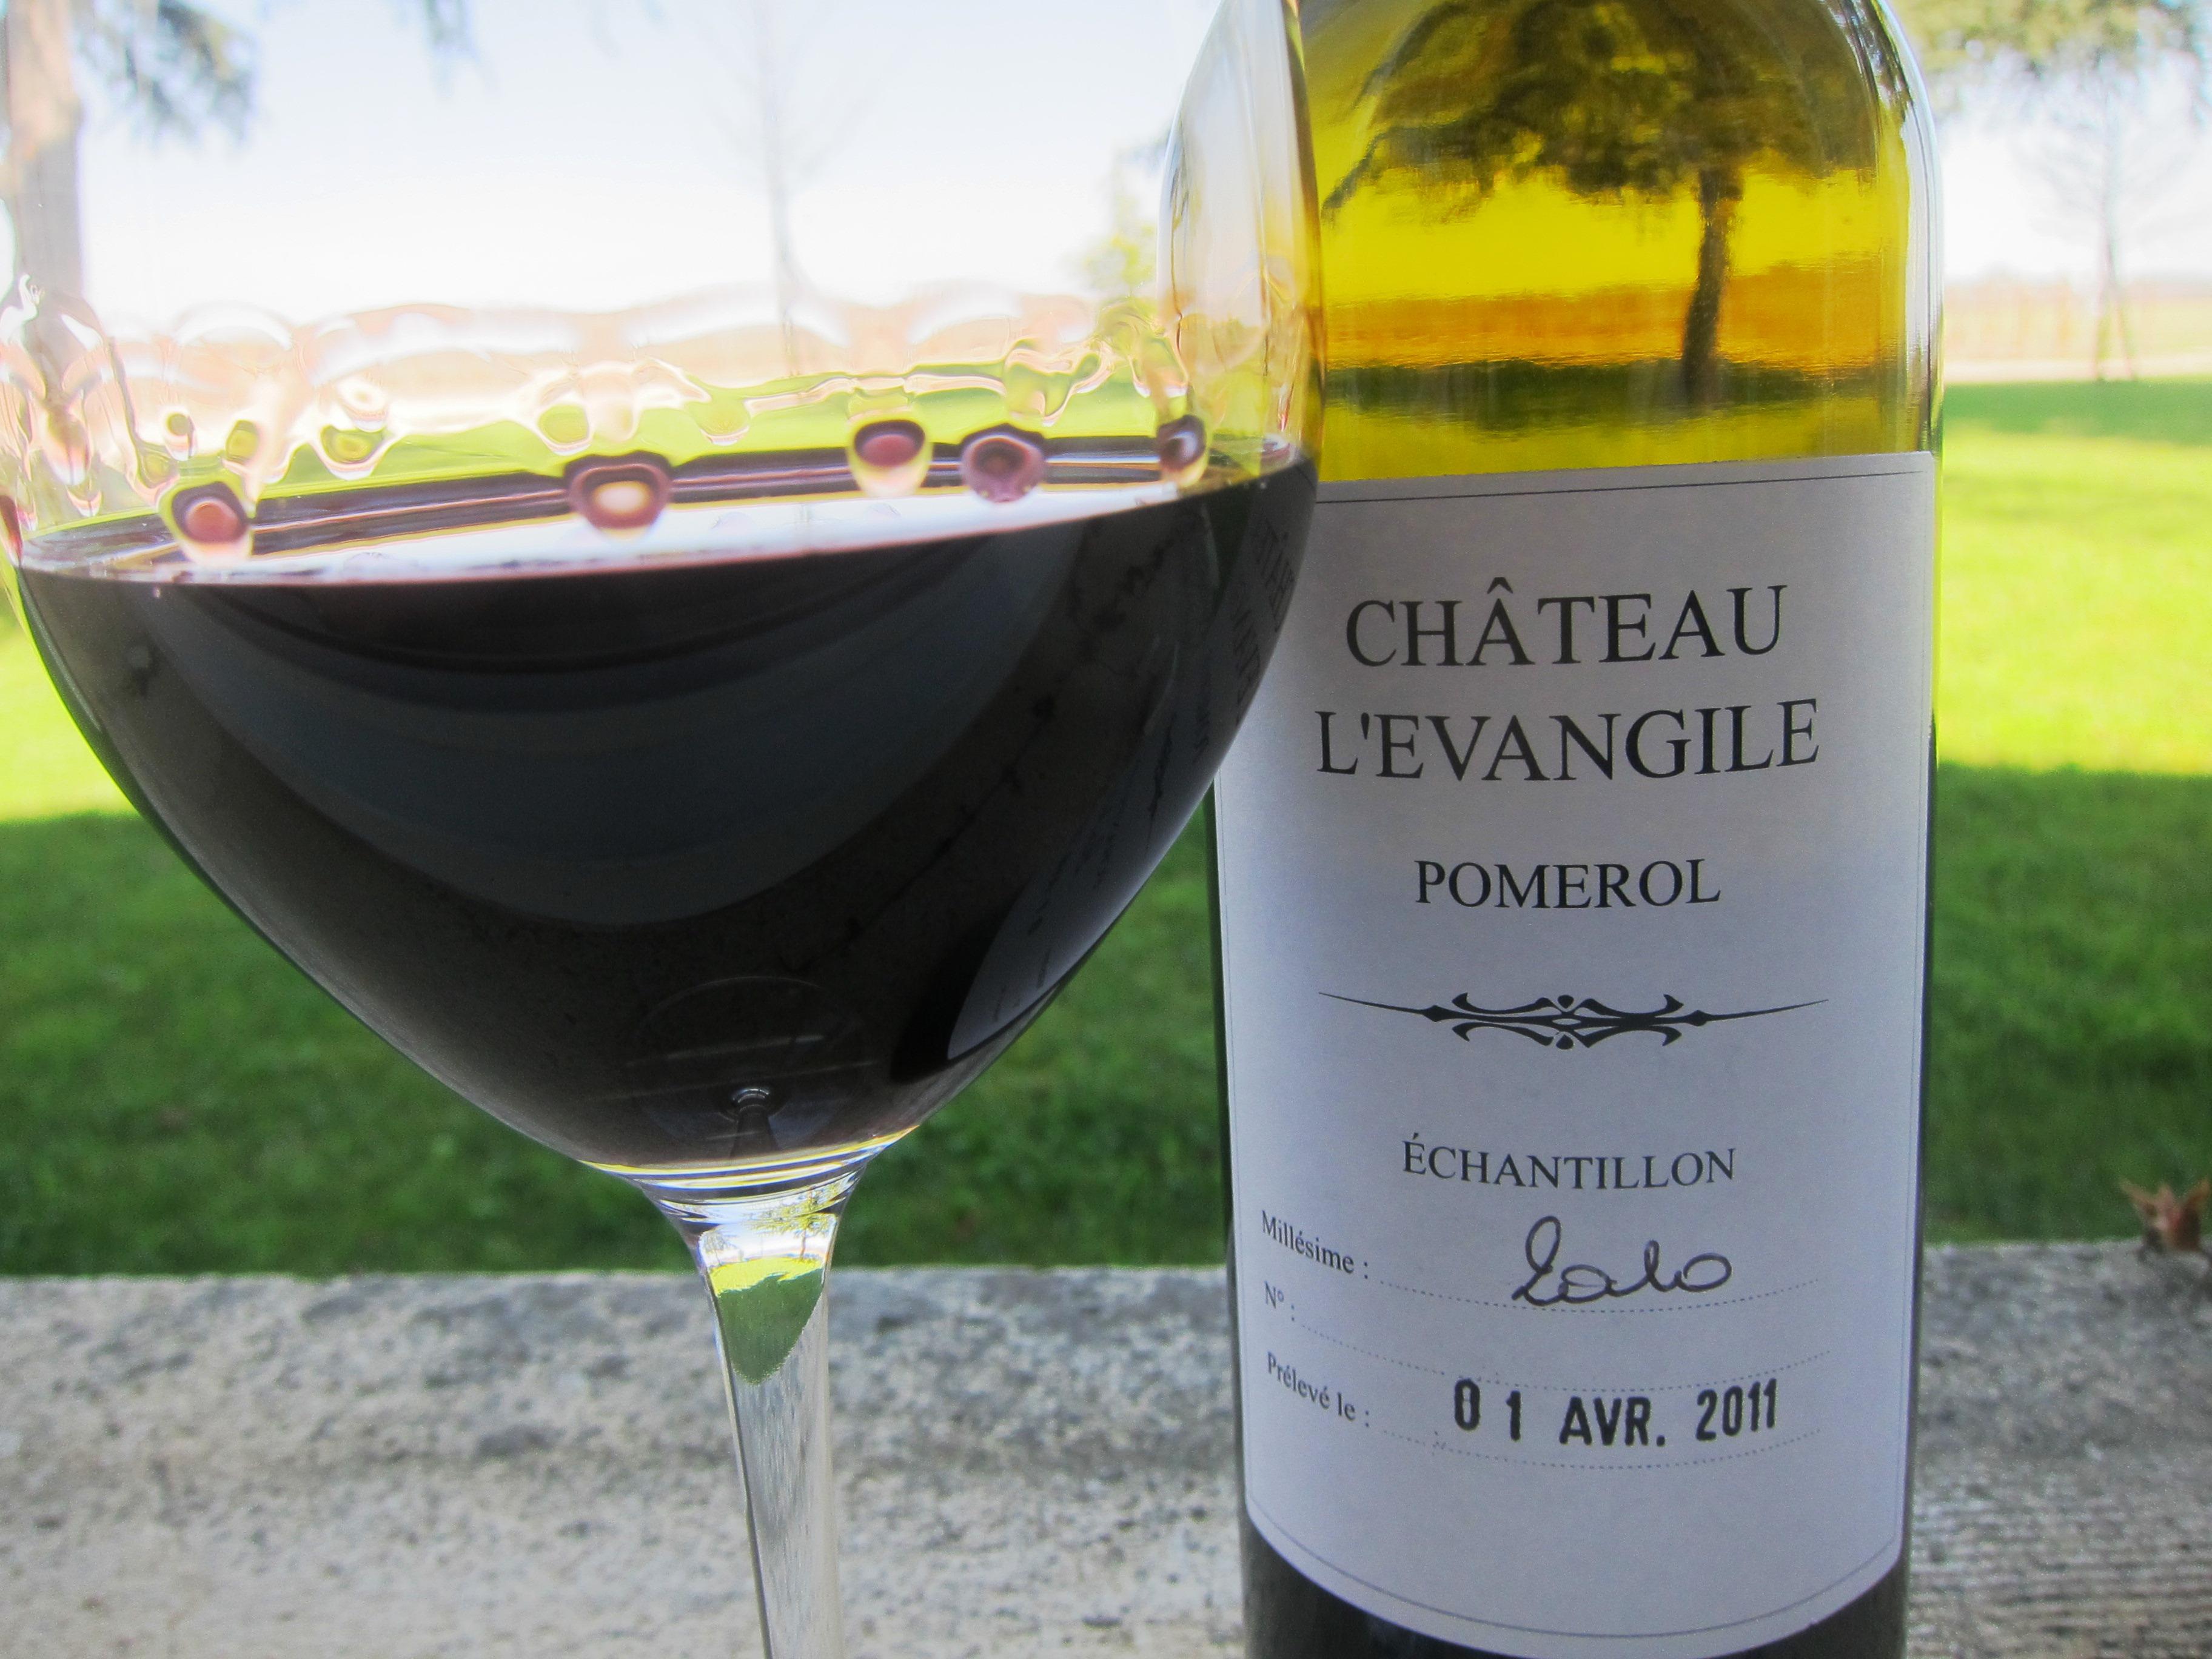 2010 l'evangile bordeaux pomerol wine